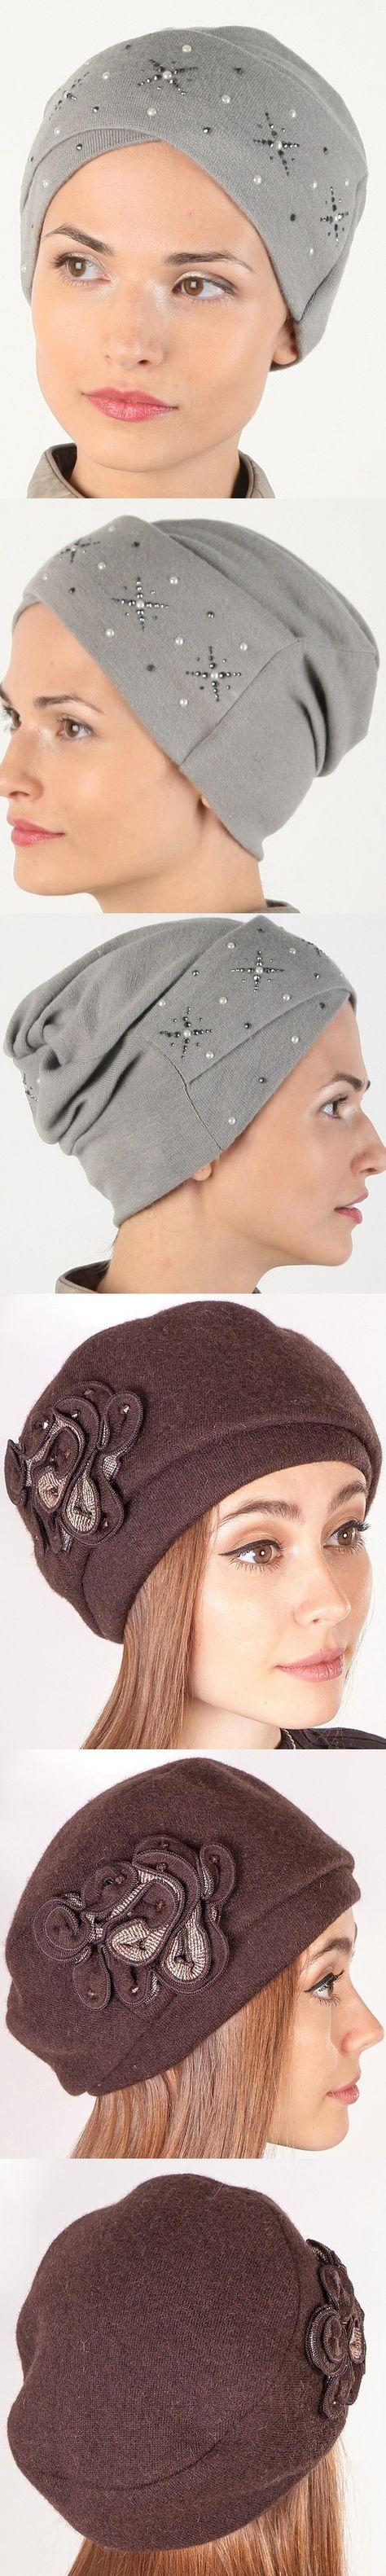 женские головные уборы | HATS by rony ronyhwang | Pinterest | Gorros ...